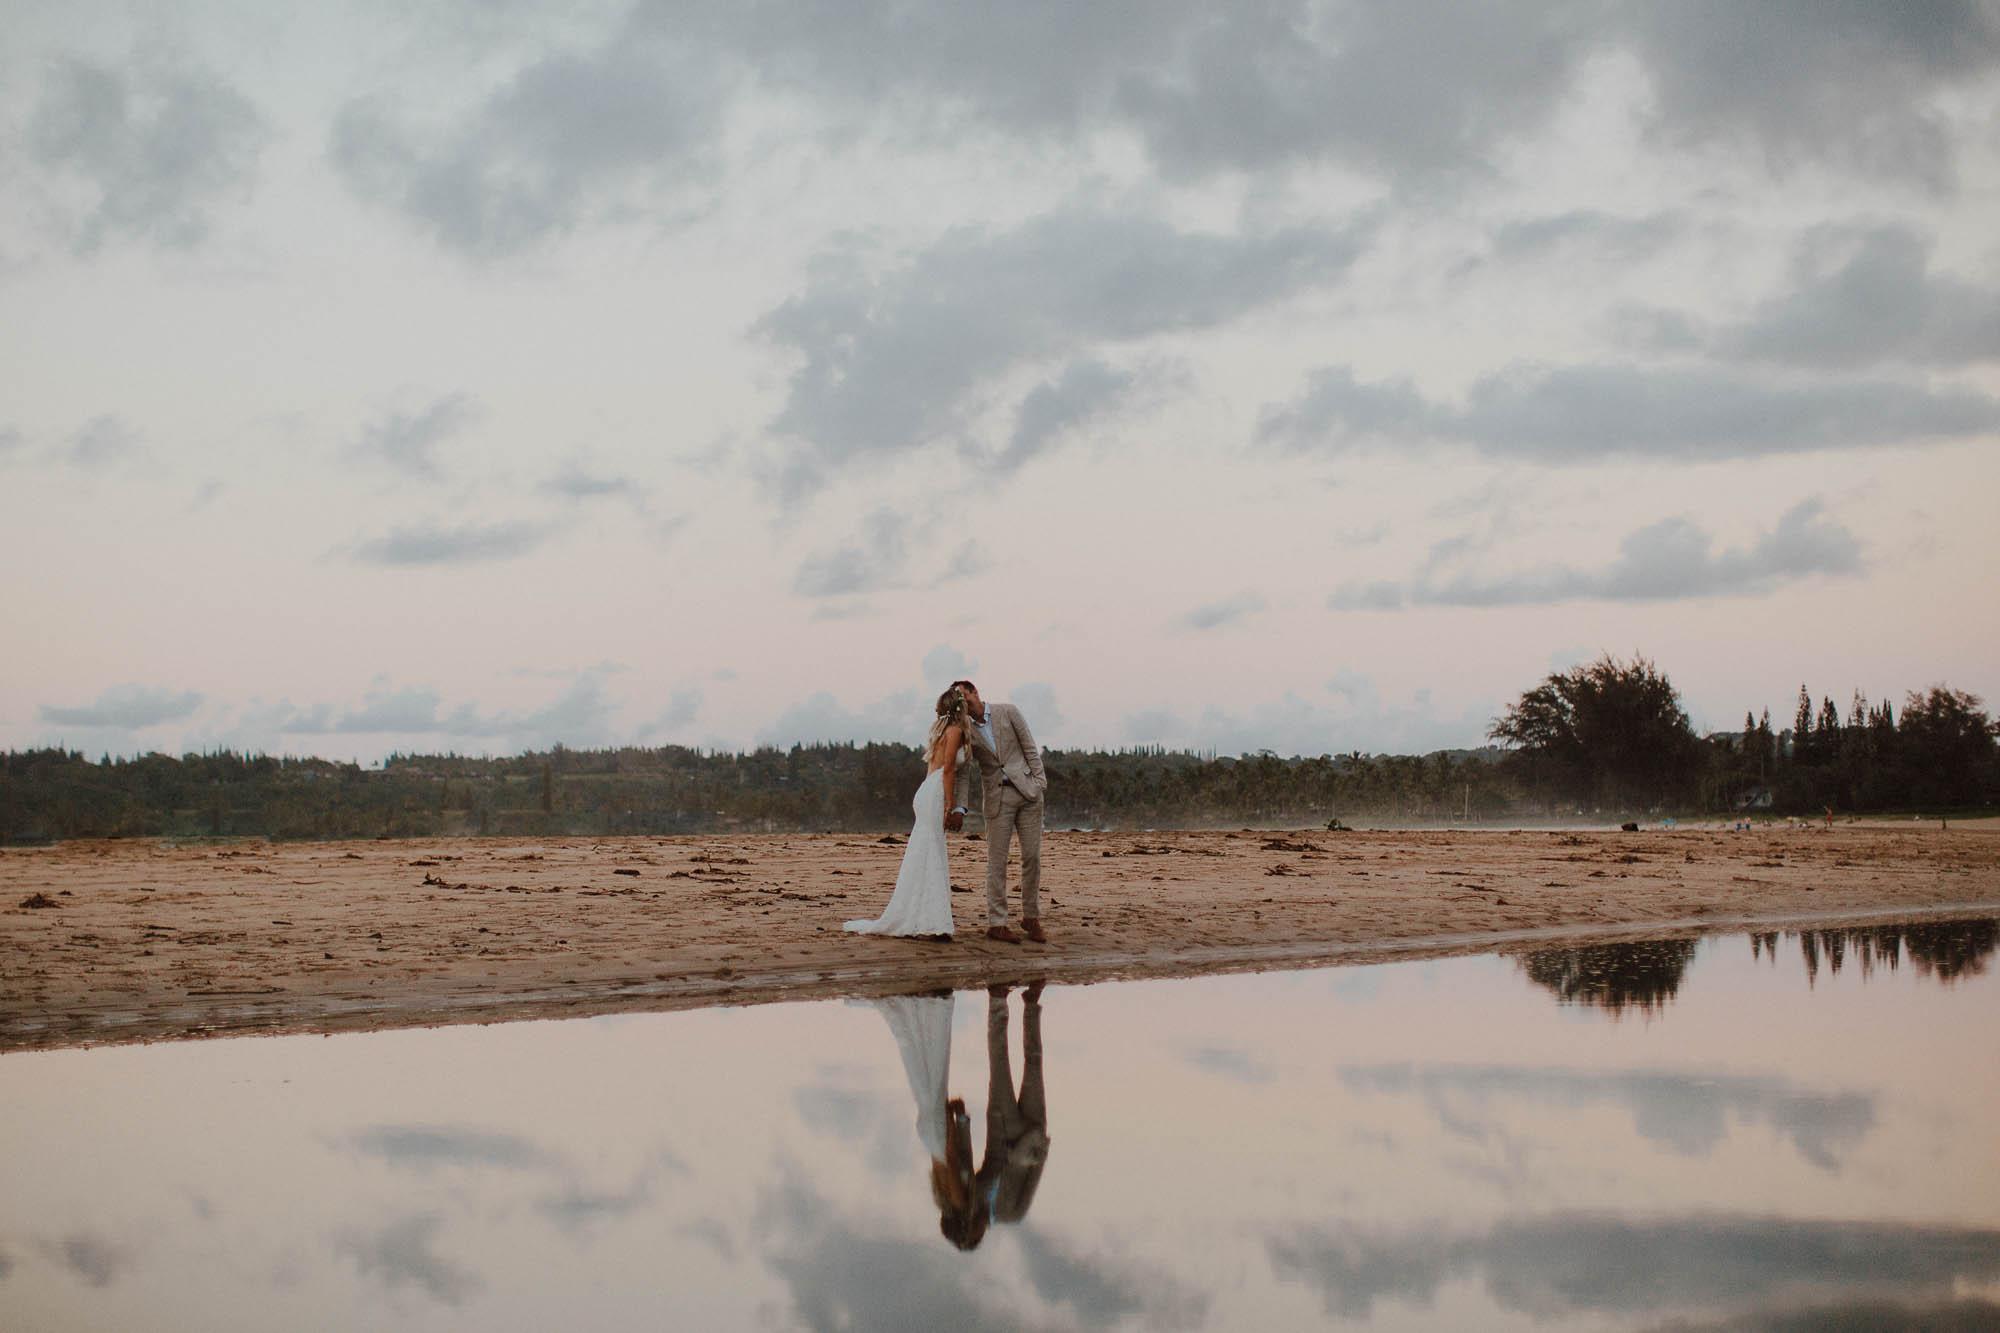 Wedding photos on hanalei bay beach at sunset north shore kauai hawaii